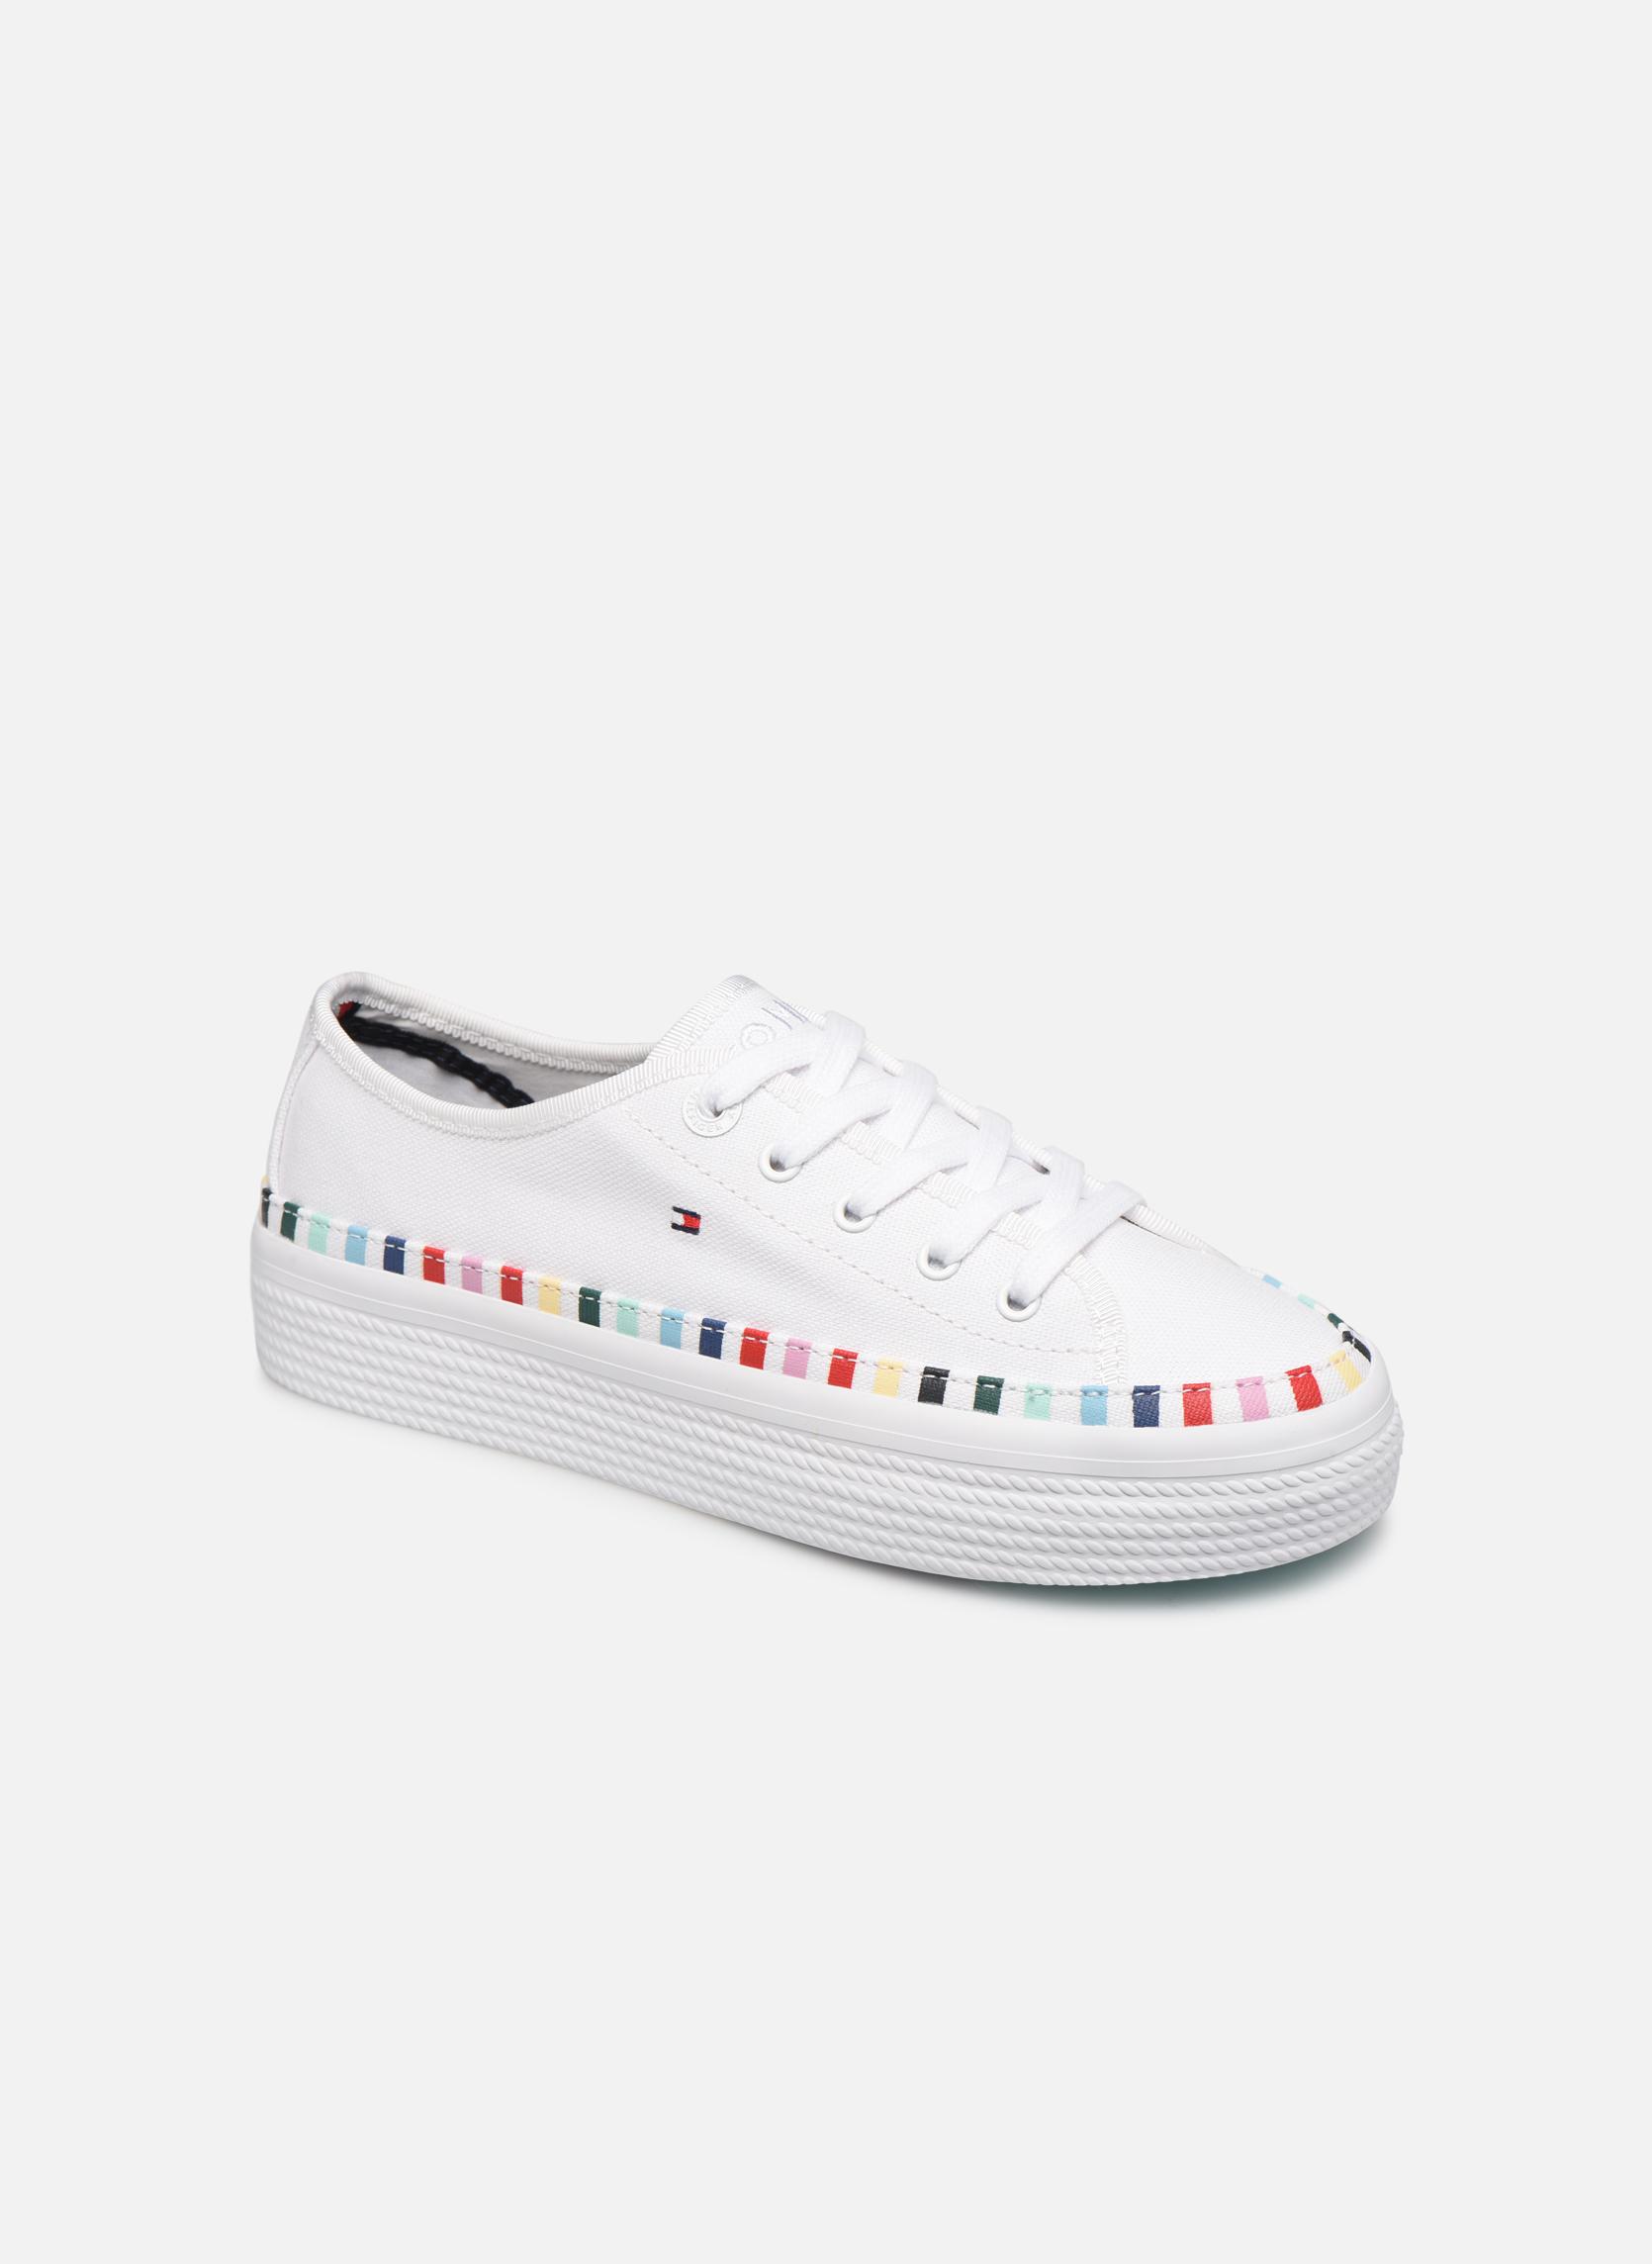 Sneakers Rainbow platform sneaker by Tommy Hilfiger